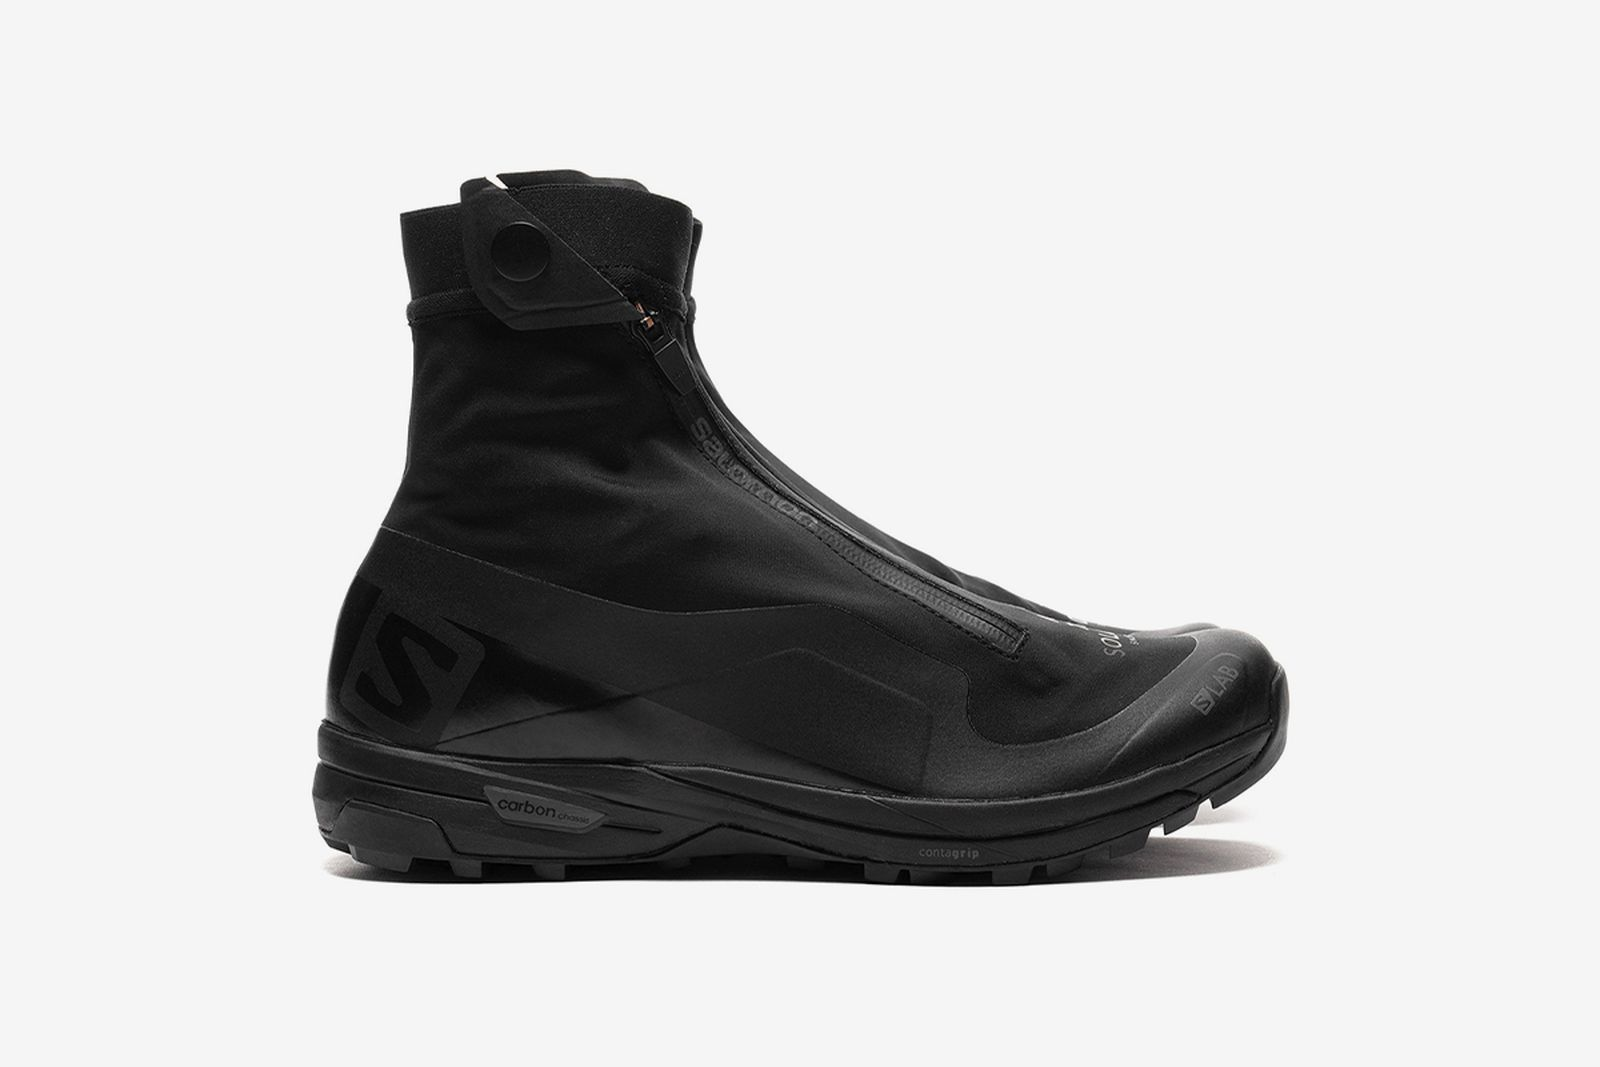 salomon-best-sneakers-03